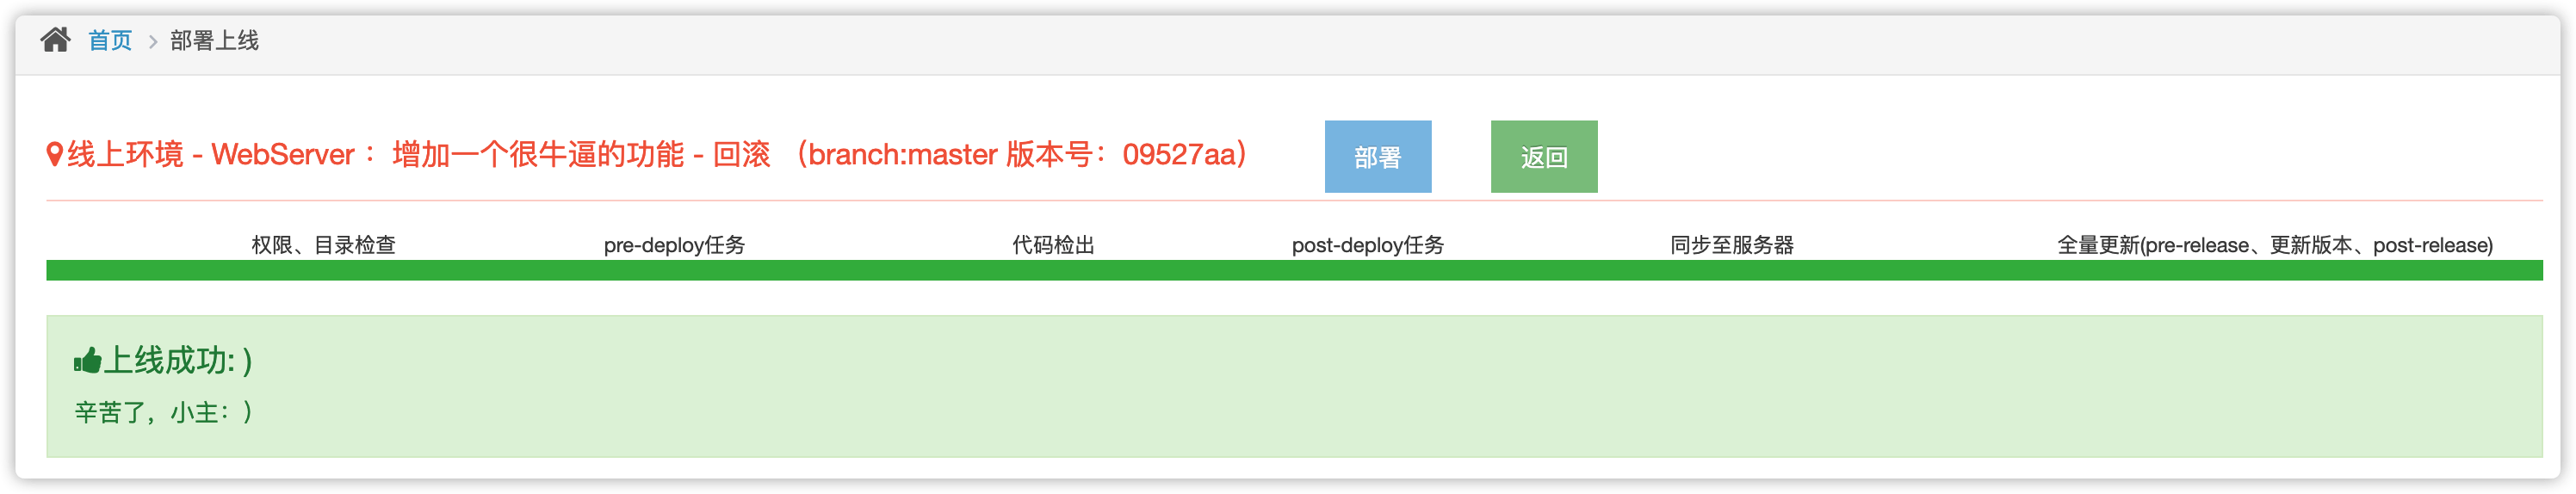 iShot2020-07-2020.21.38